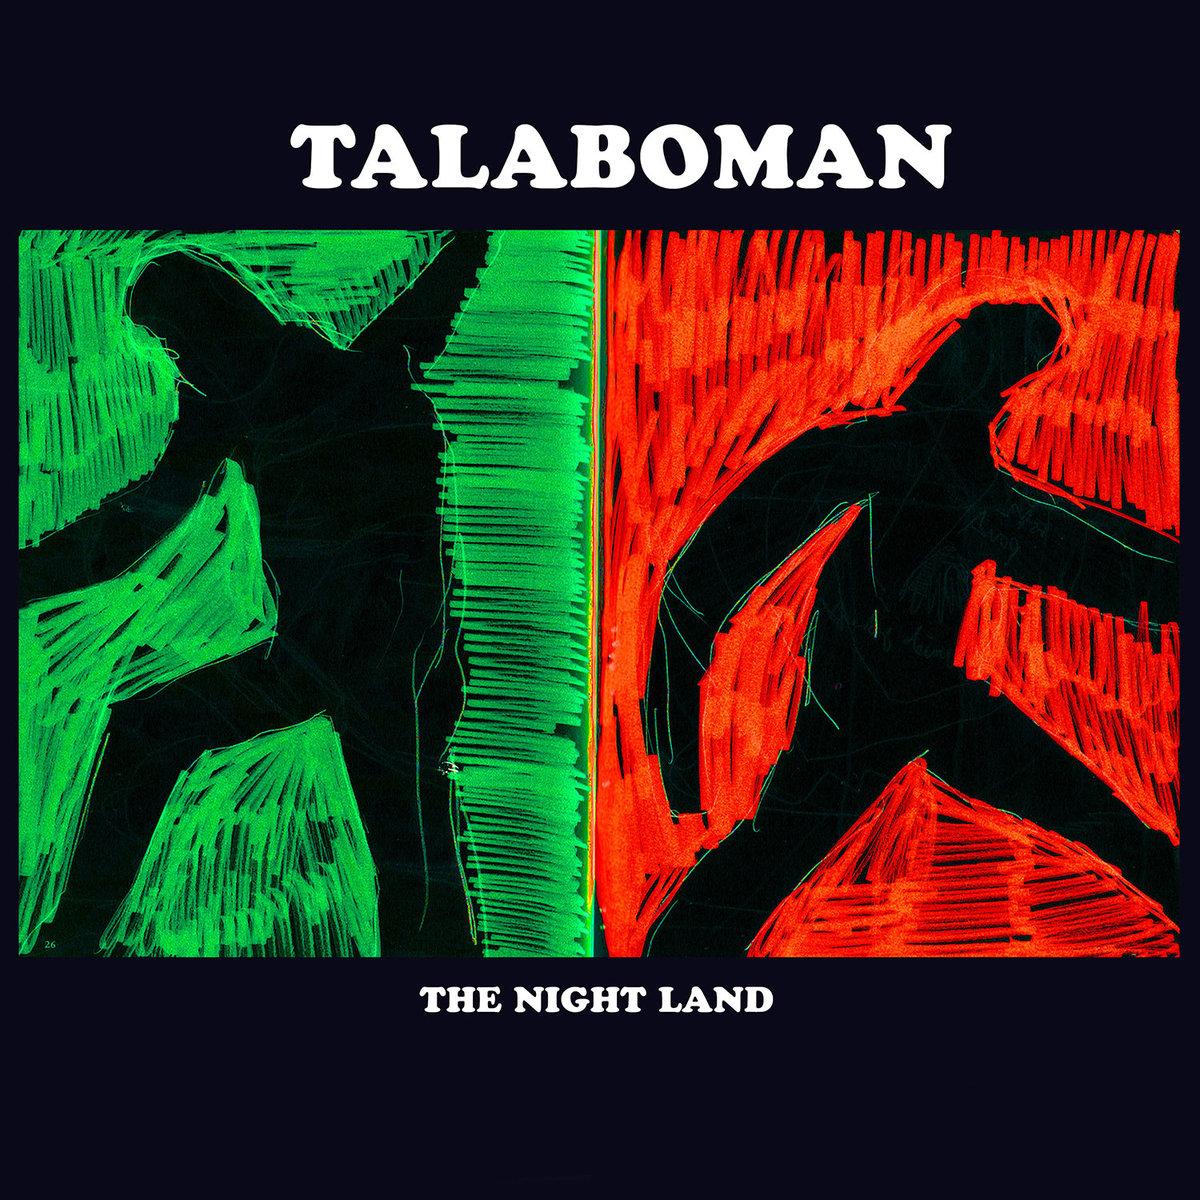 TALABOMAN - THE NIGHT LAND (R&S, 2017)